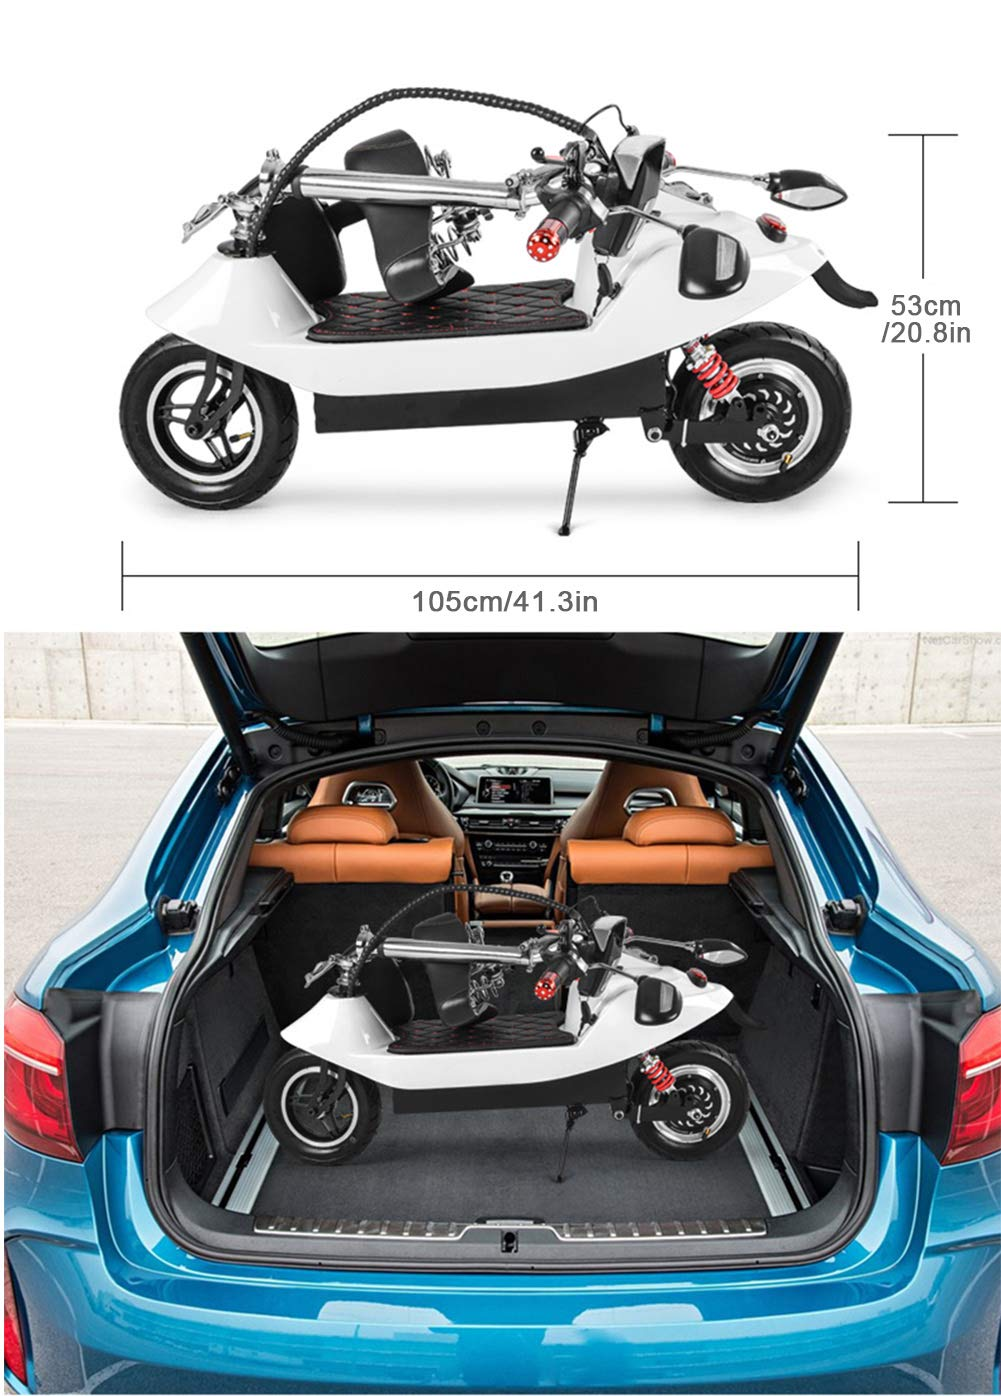 Amazon.com: Bicicletas eléctricas plegables para adultos ...